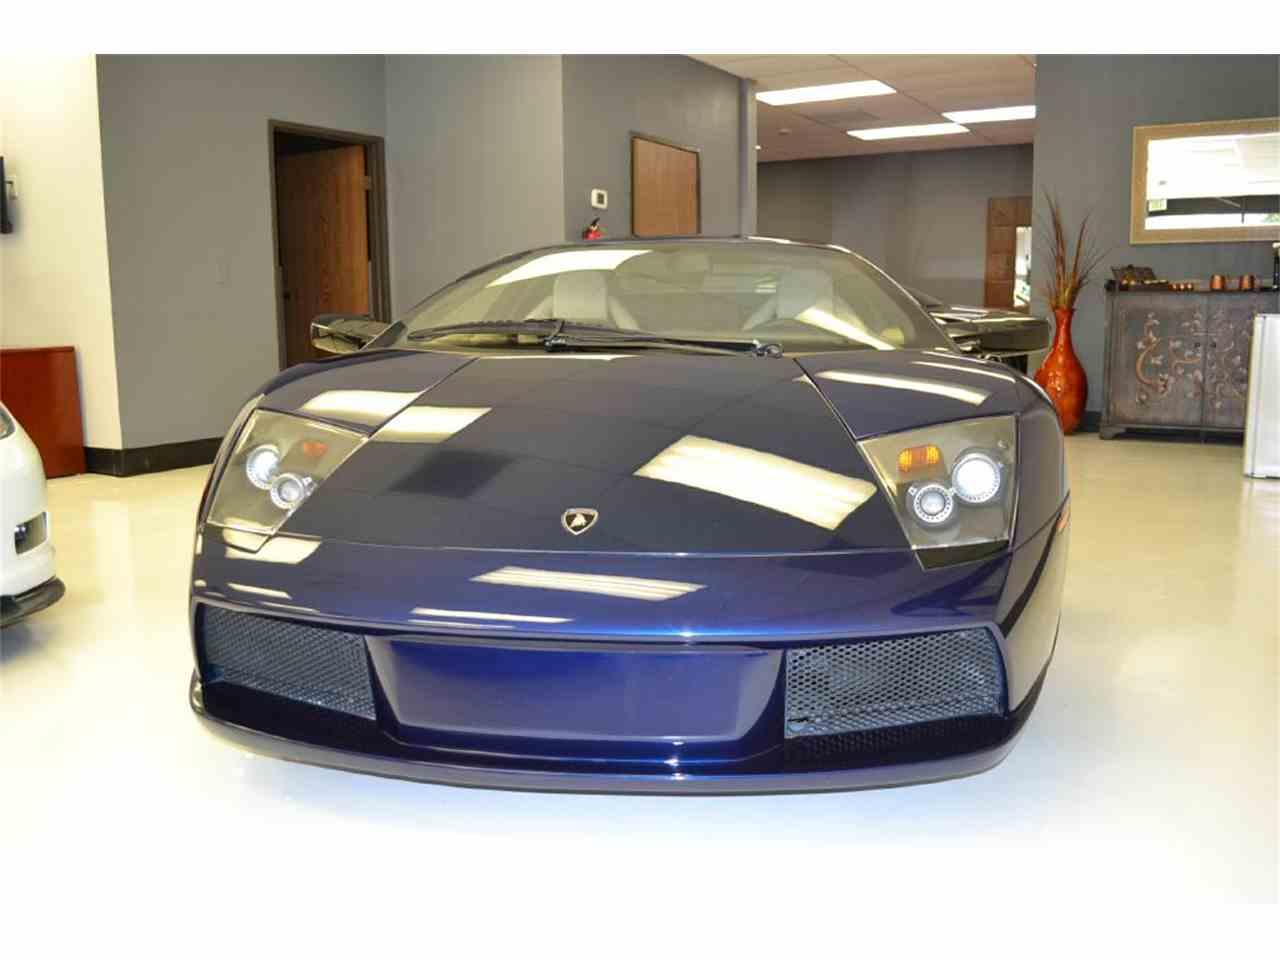 Large Picture of 2004 Lamborghini Murcielago located in Temecula California Offered by Fortunauto 13 LLC - LVJ1